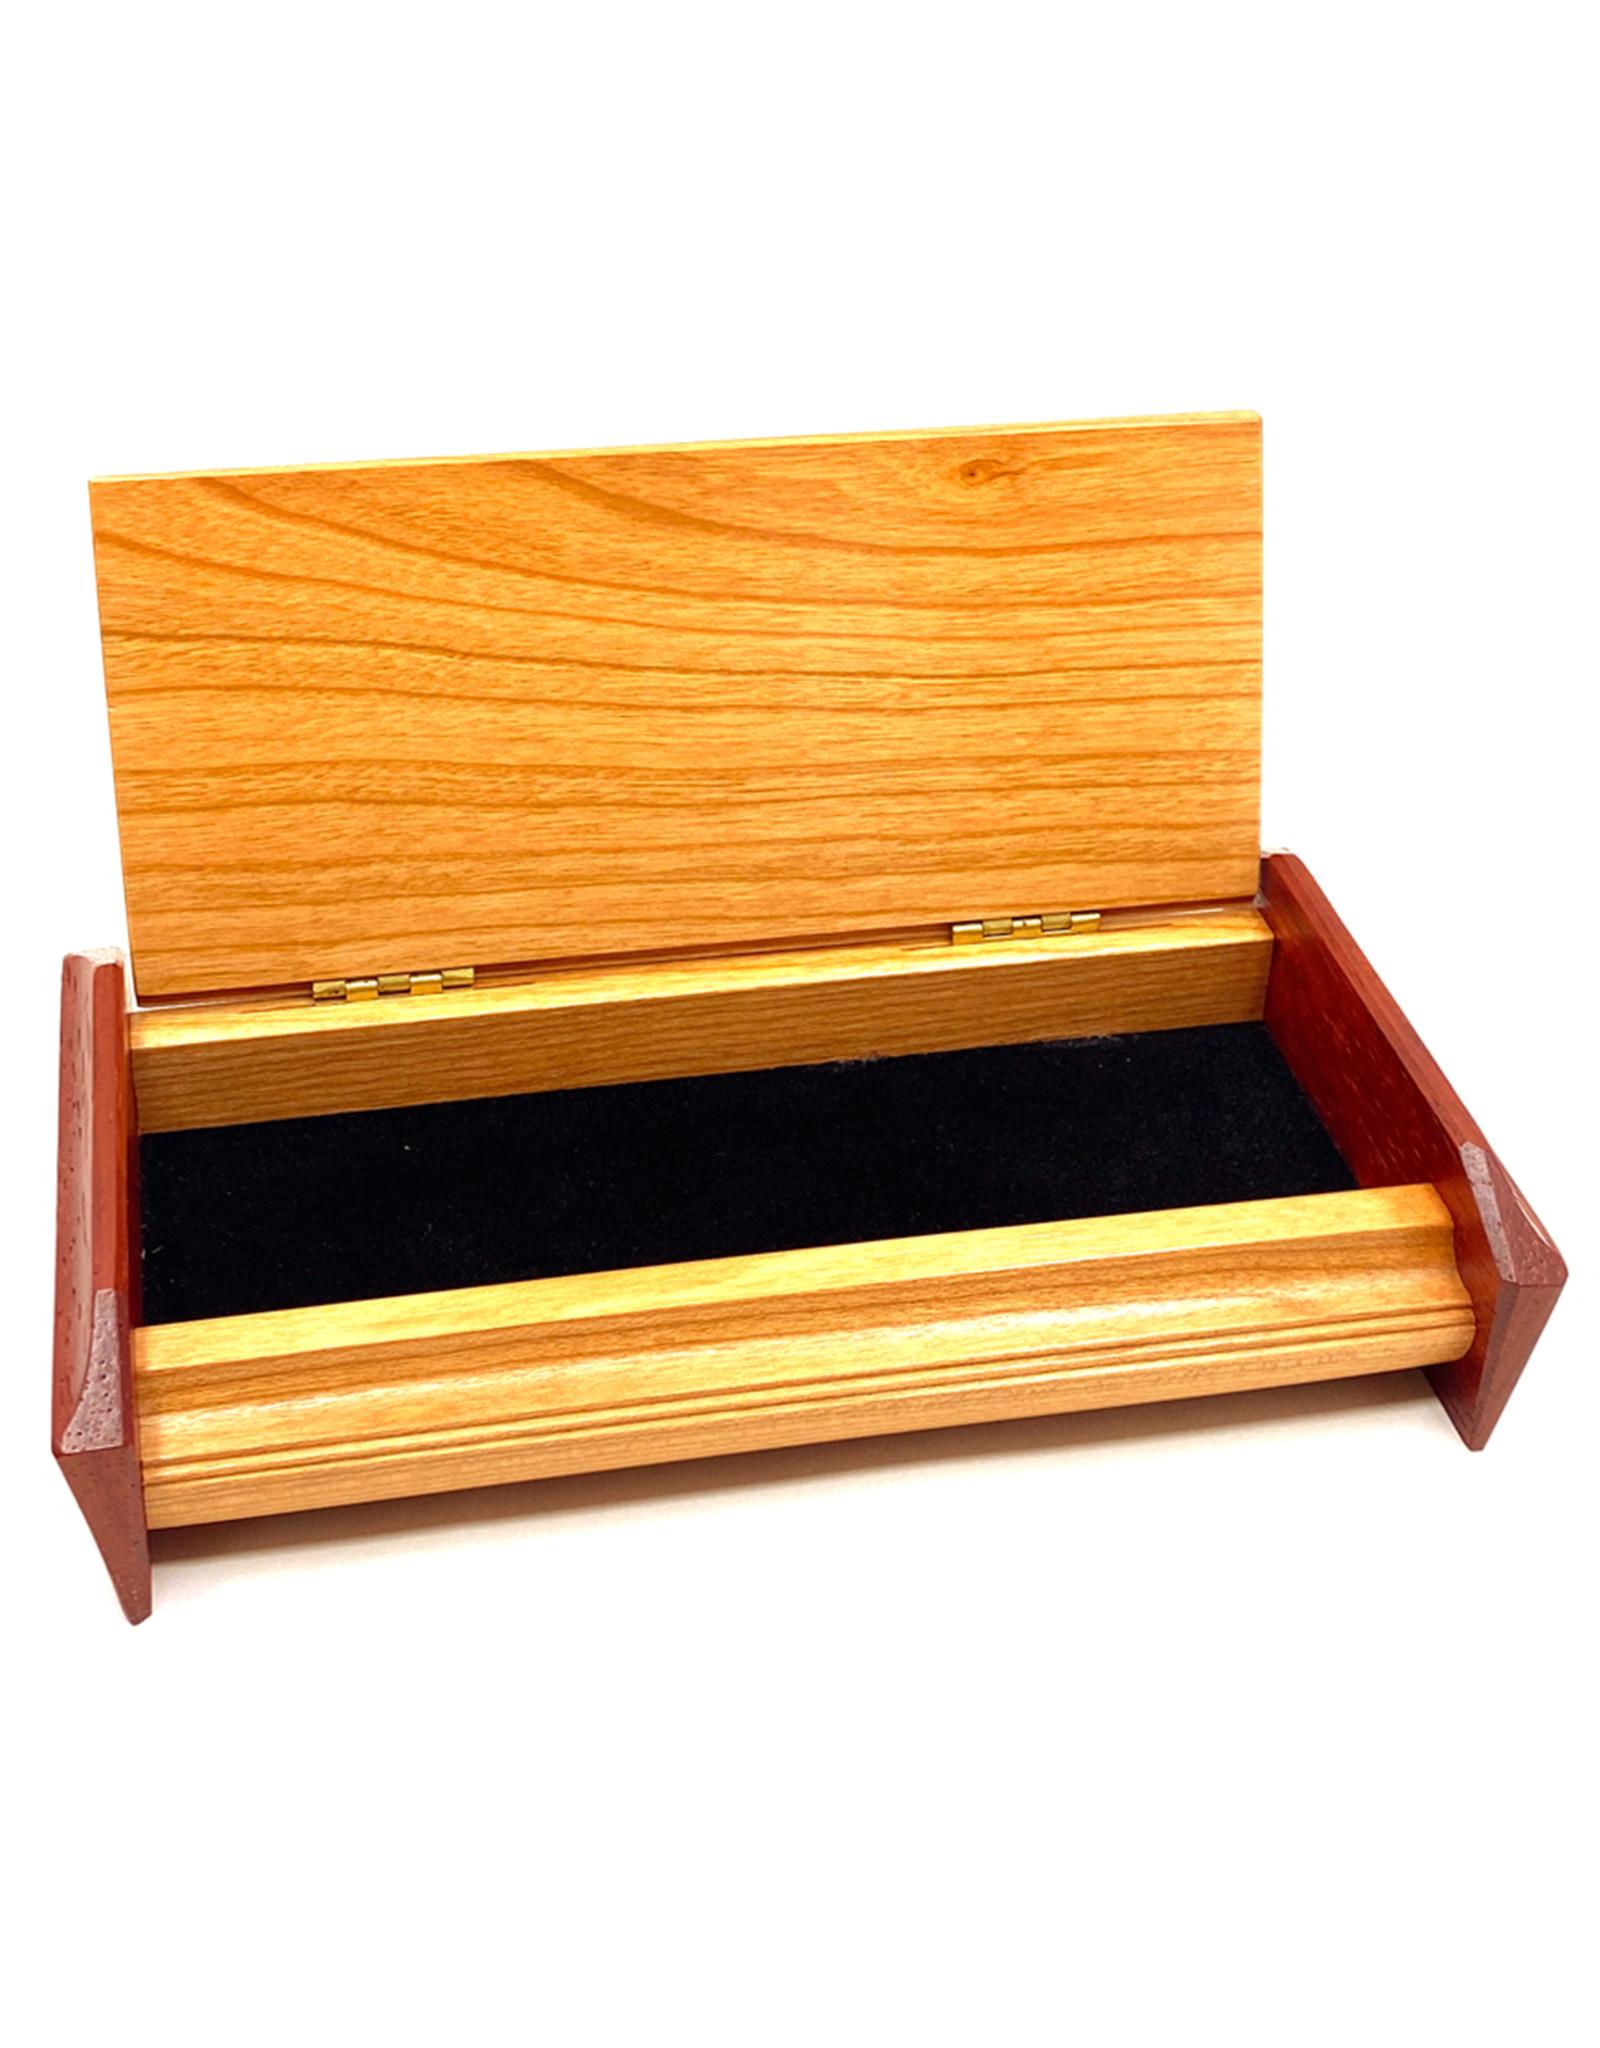 MIKUTOWSKI WOODWORKING CHERRY & PADUAK KEEPSAKE TREASURE BOX